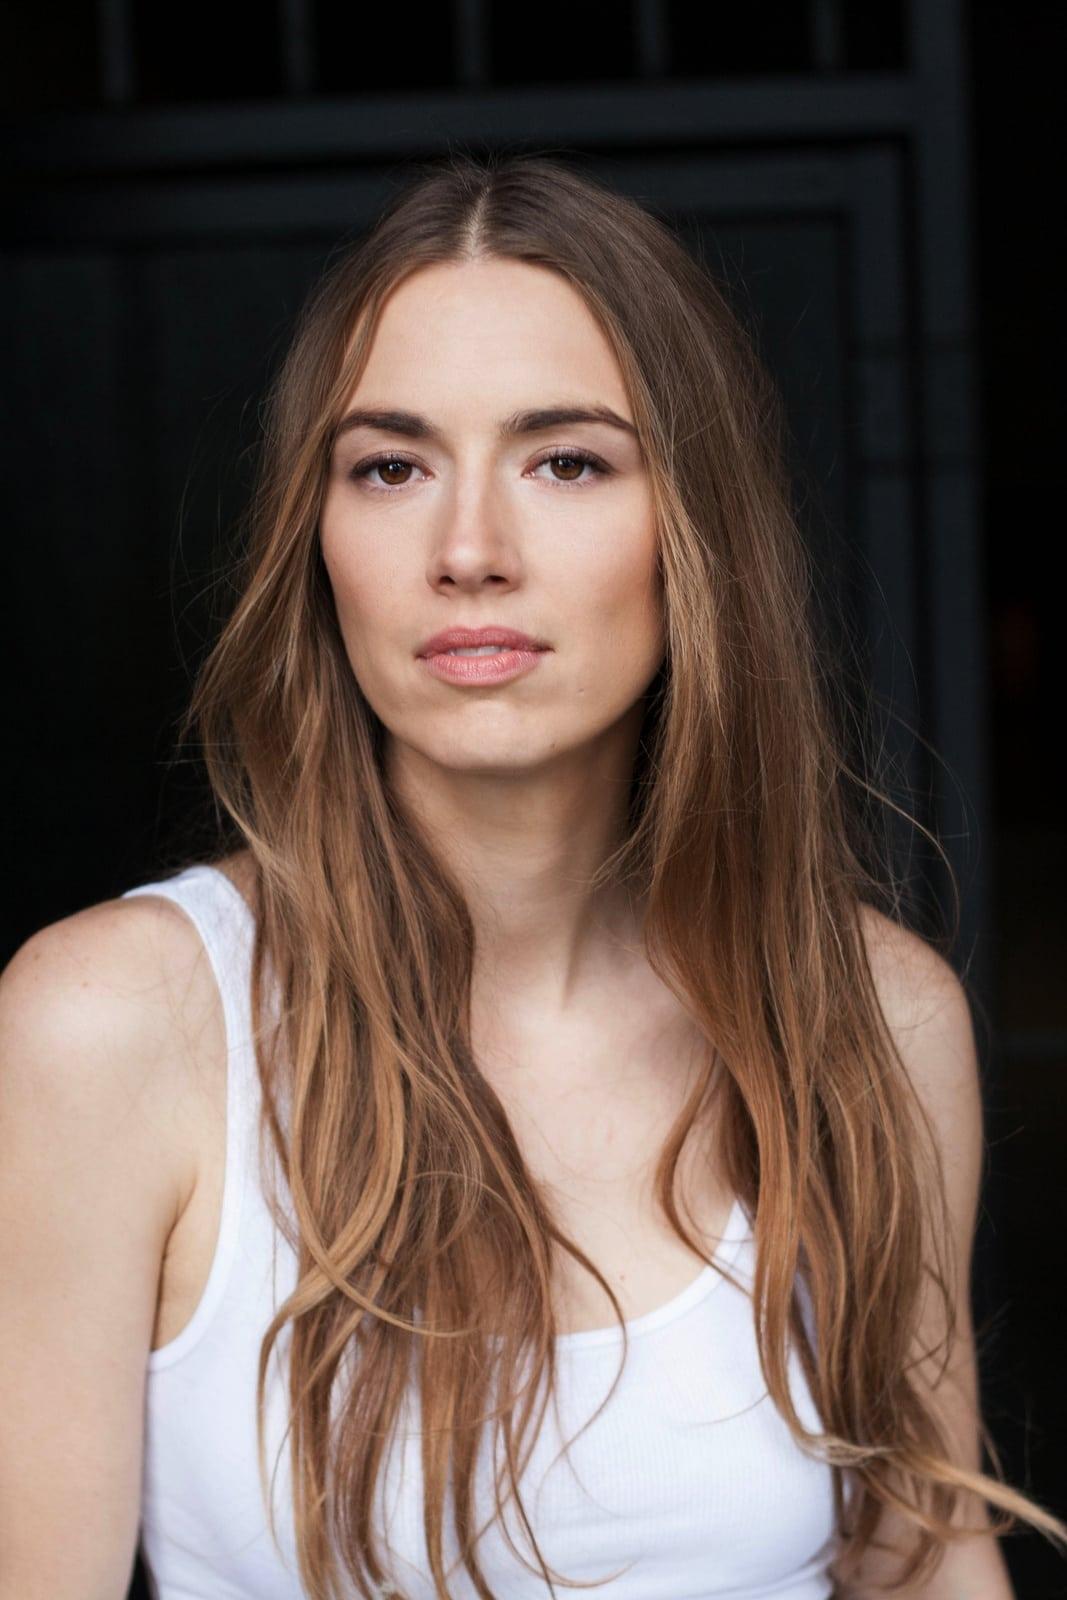 Kaitlin Ferrell